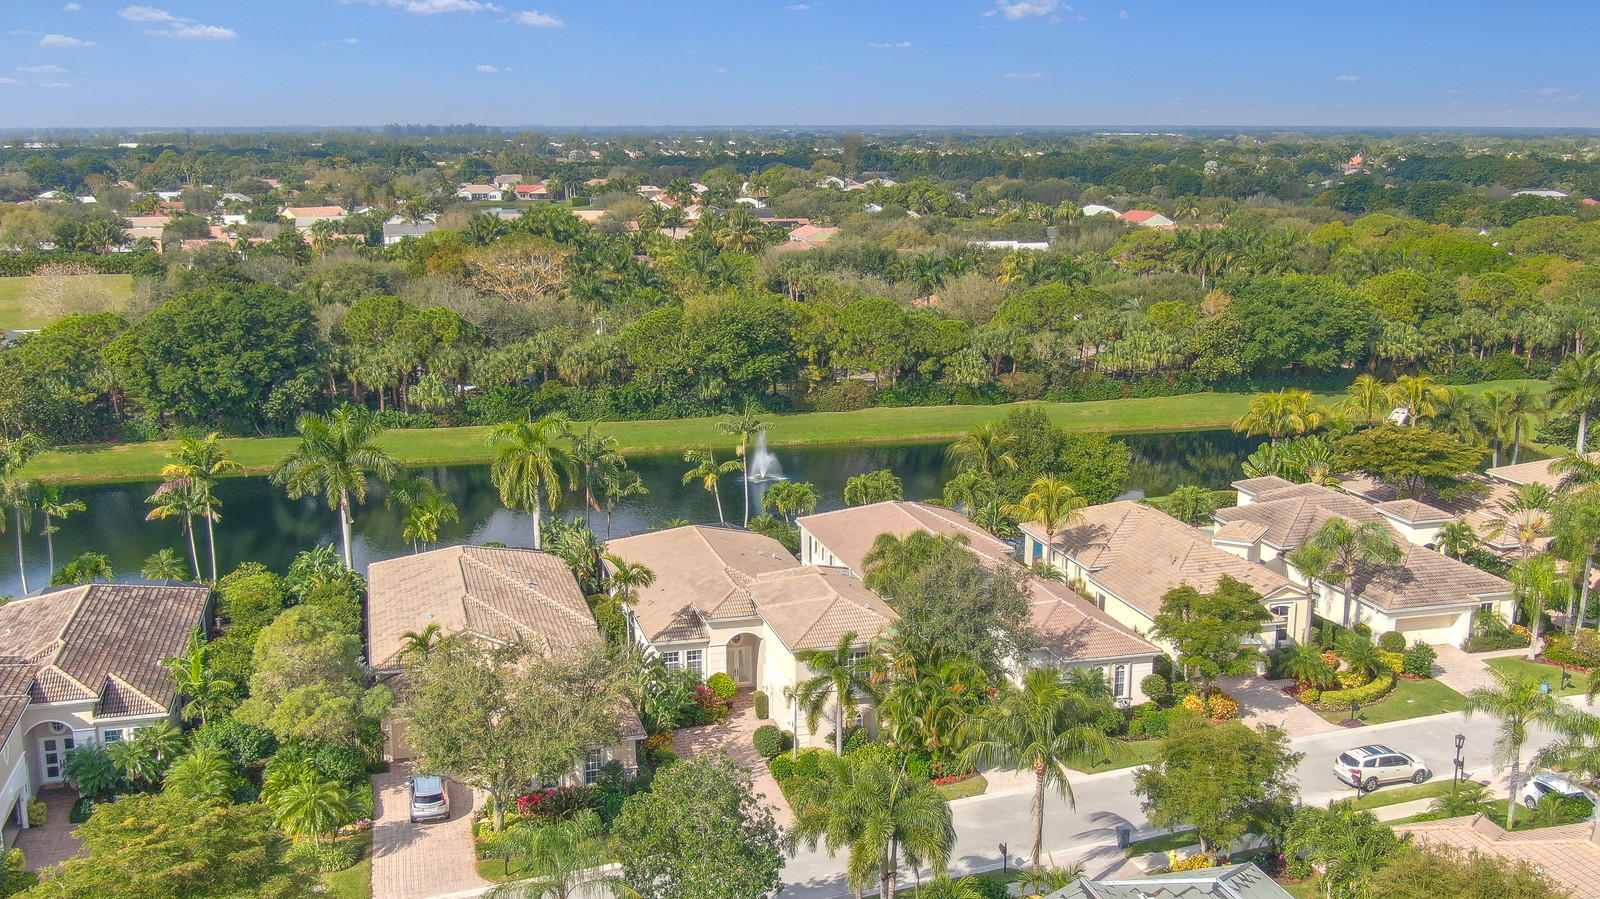 34 Laguna Terrace, Palm Beach Gardens, Florida 33418, 4 Bedrooms Bedrooms, ,3.1 BathroomsBathrooms,A,Single family,Laguna,RX-10598745